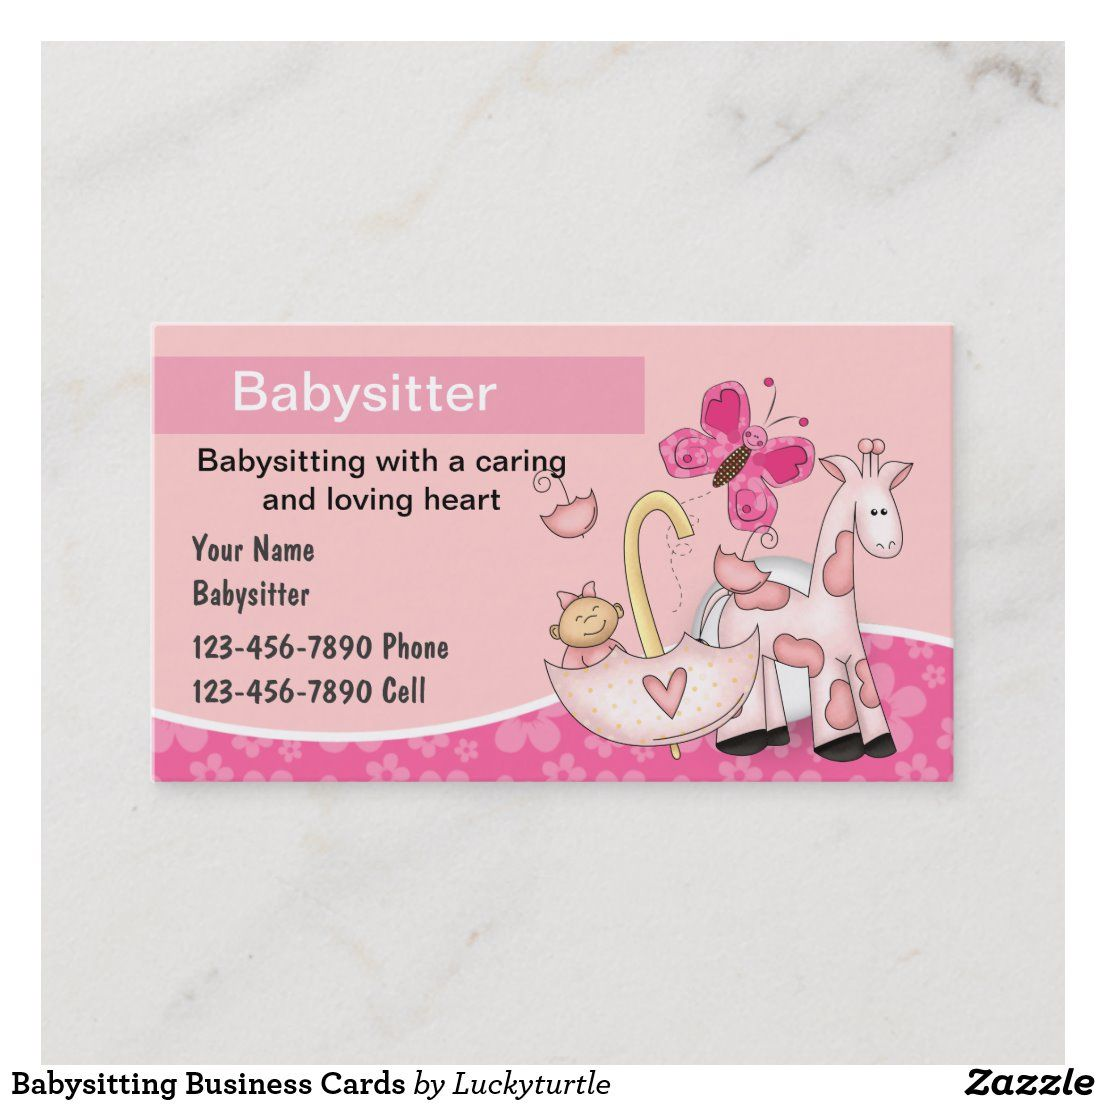 Babysitting Business Cards Zazzle Com Business For Kids Business Cards Childcare Business Cards